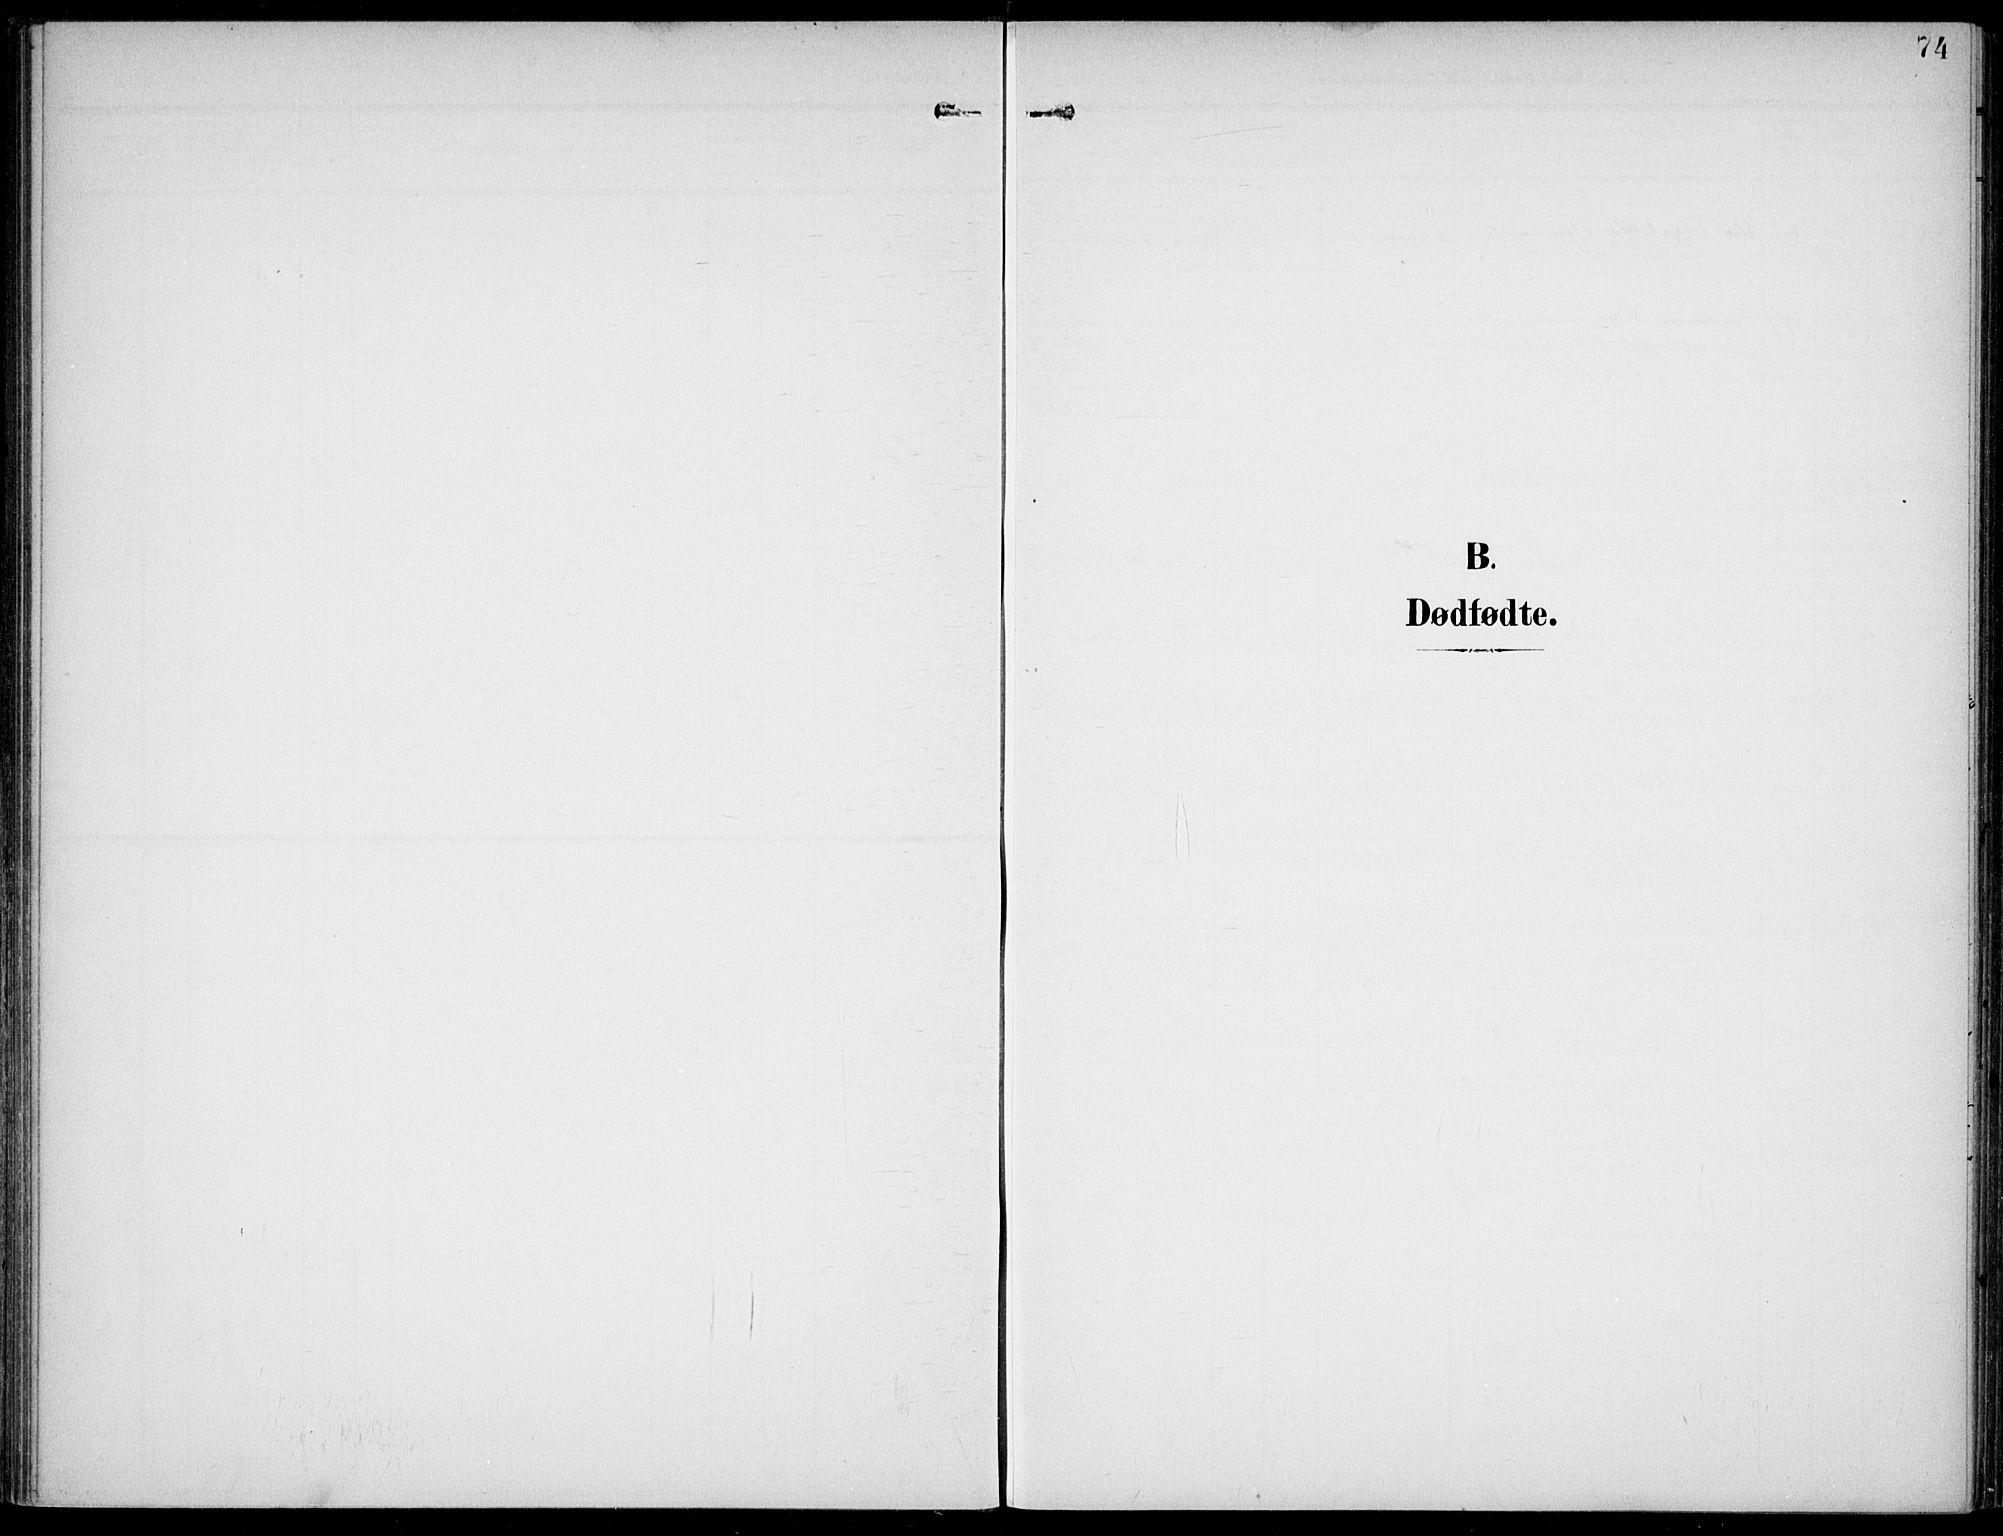 SAKO, Lunde kirkebøker, F/Fa/L0004: Ministerialbok nr. I 4, 1902-1913, s. 74